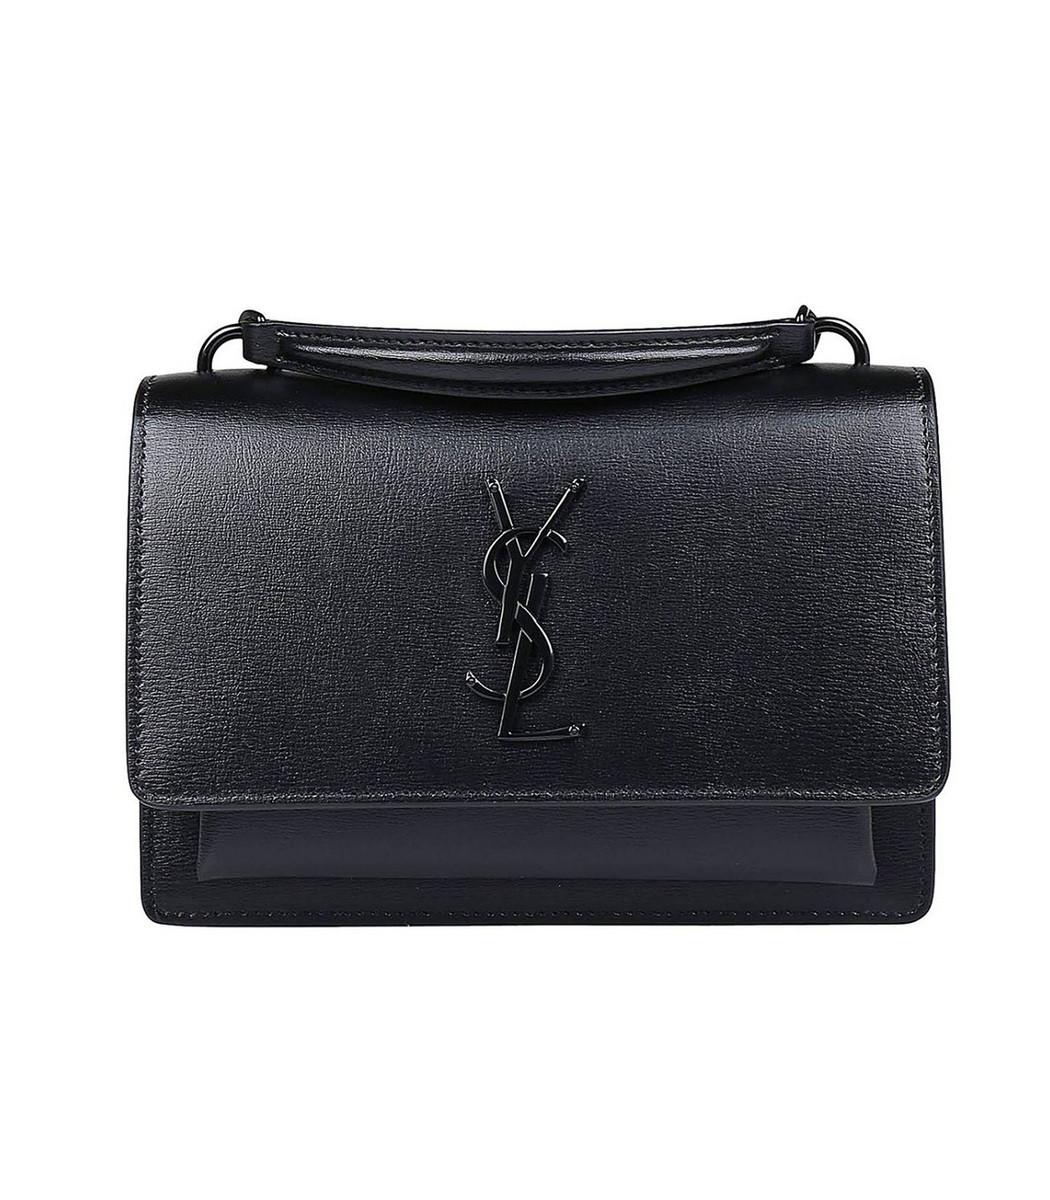 49218bb0e935 Saint Laurent YSL Small Sunset Monogram Bag - ShopBAZAAR